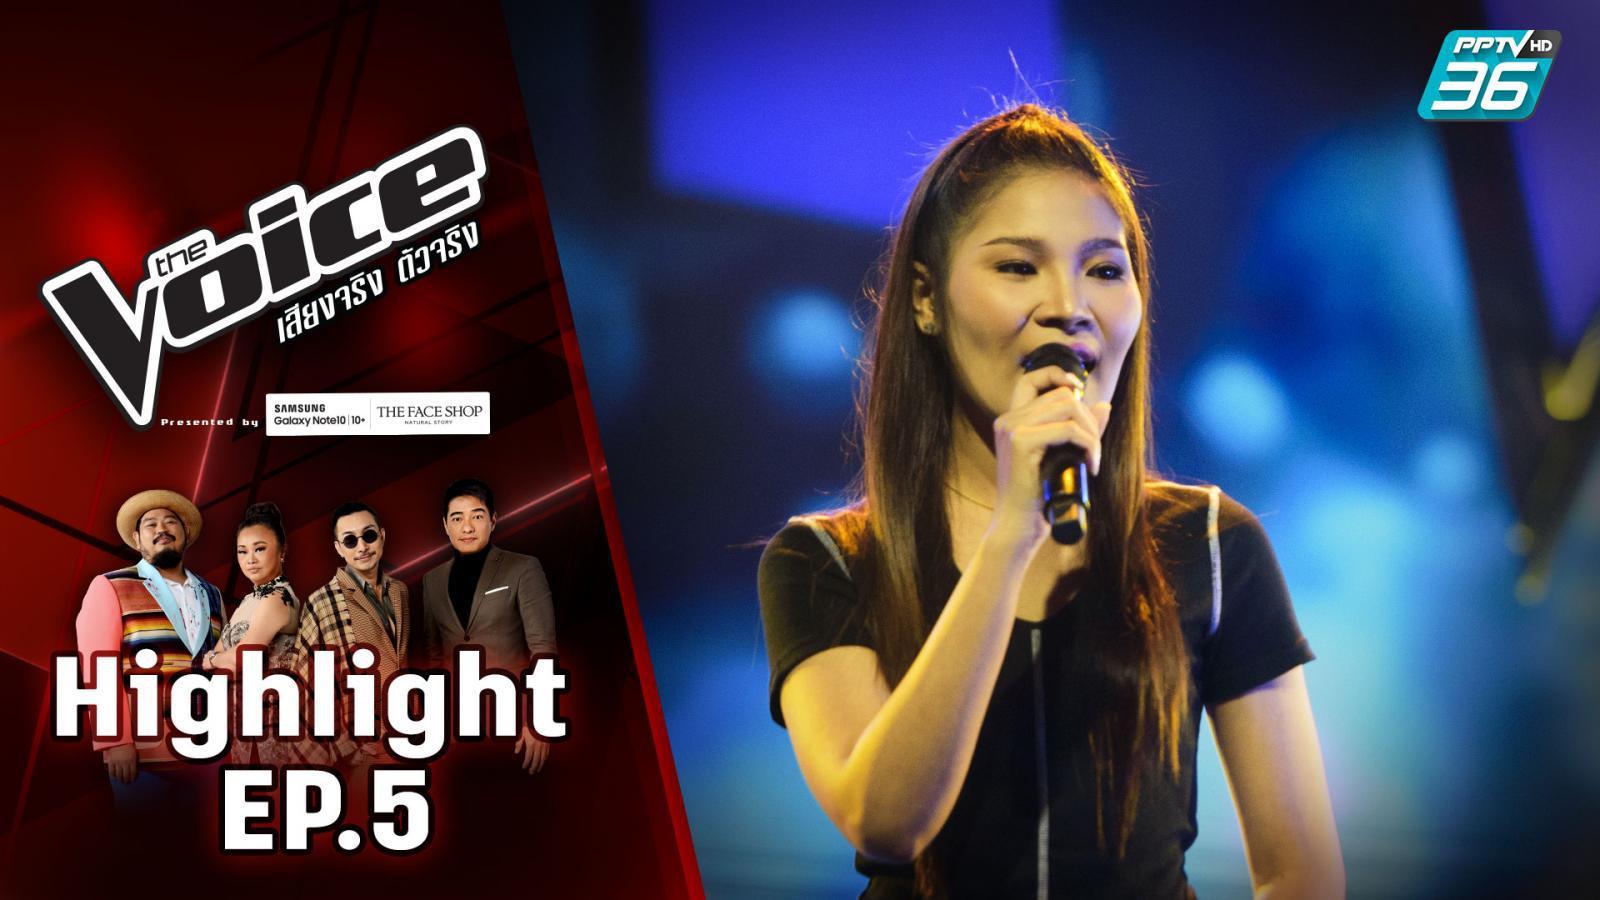 The Voice 2019 | จูน สาวนครปฐม เสียงร้องเหลือใช้ สตริงก็ได้ ลูกทุ่งก็ถึง  | Highlight EP5